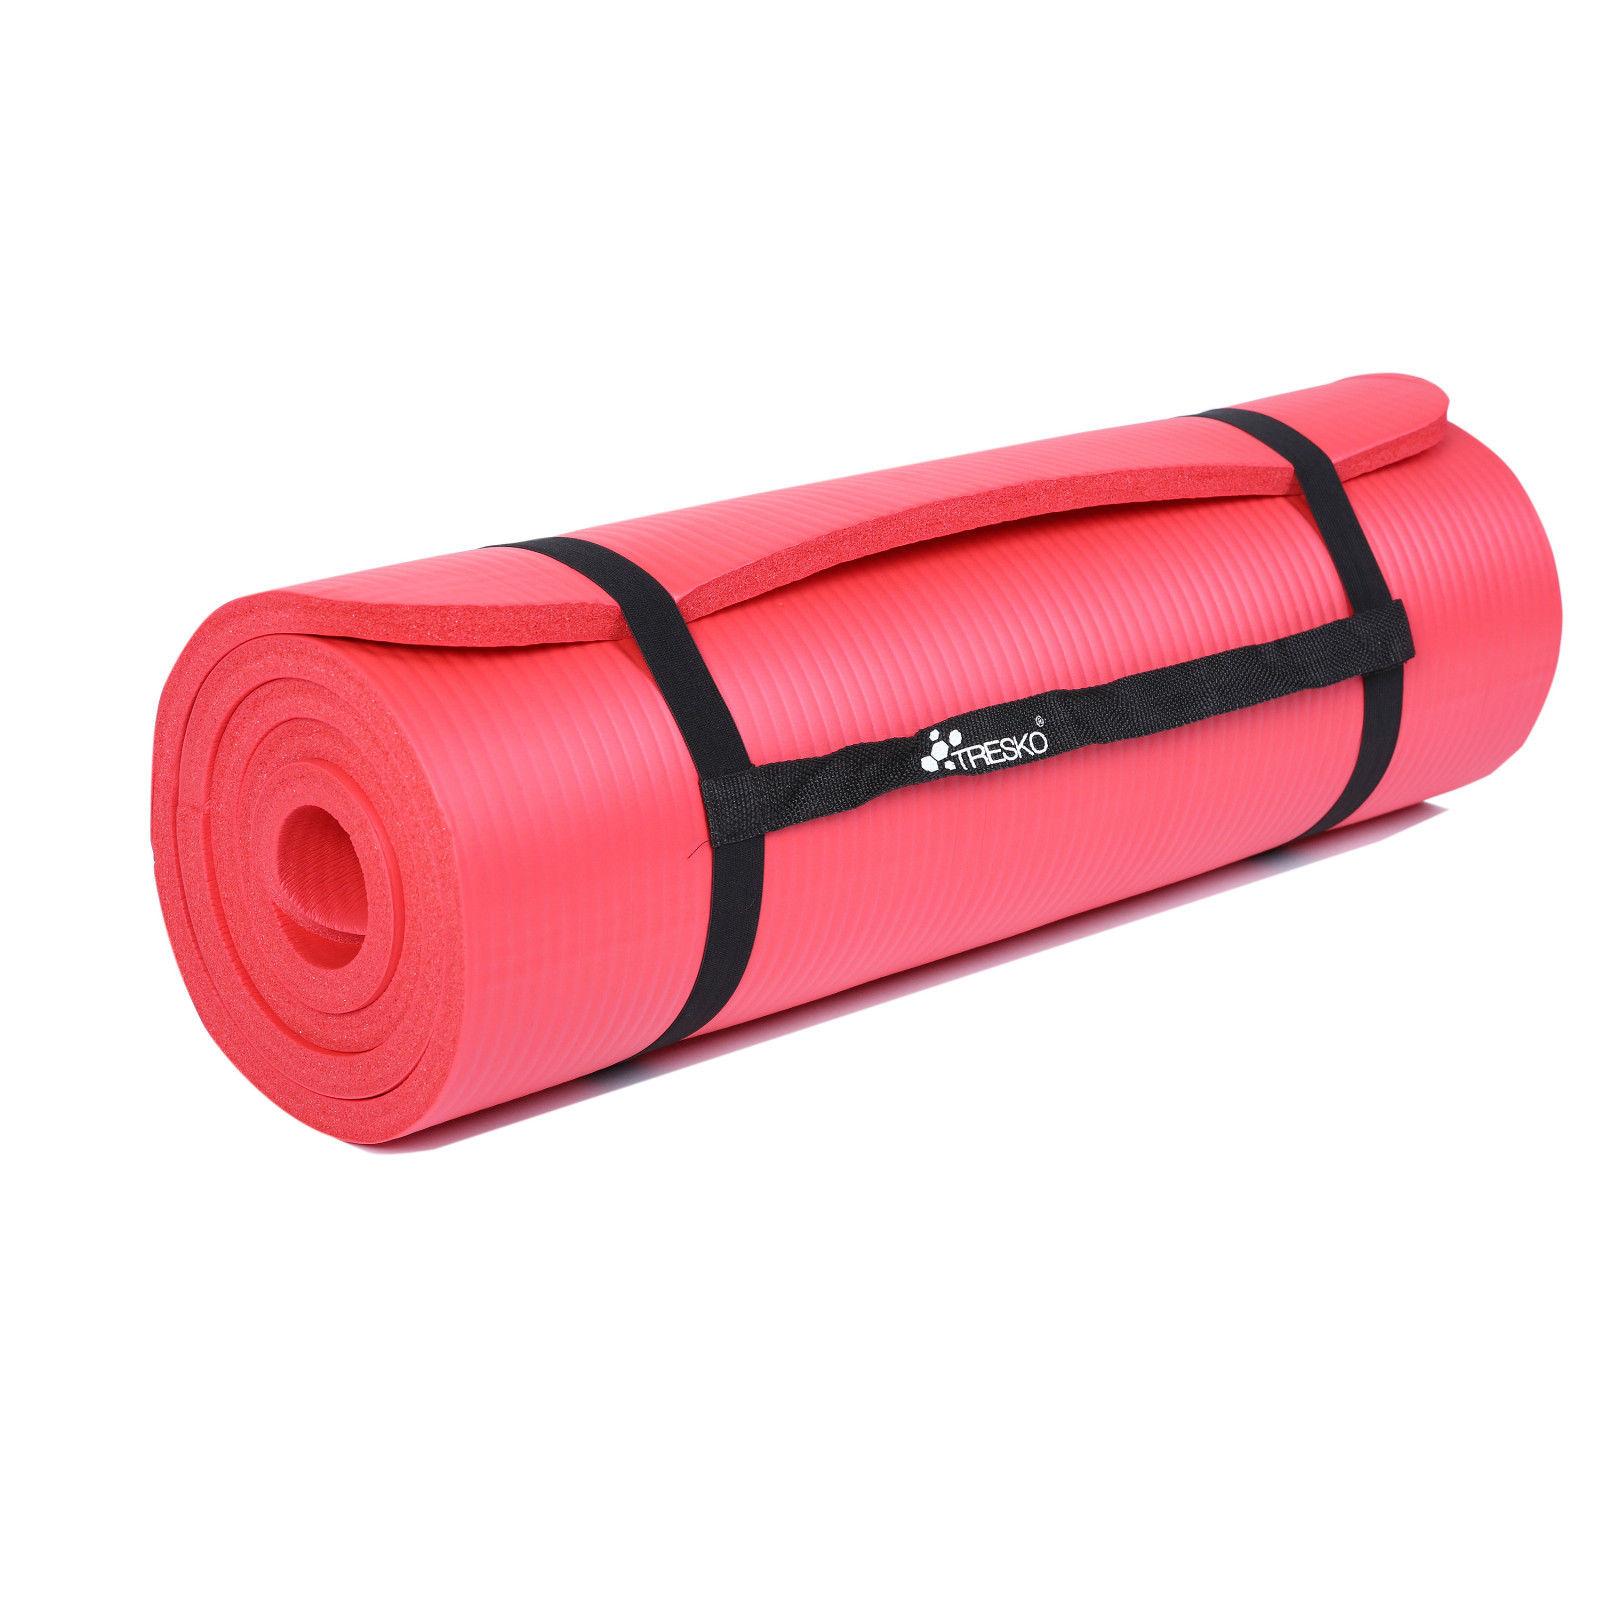 Yogamatte-Fitnessmatte-Gymnastikmatte-Pilates-Sportmatte-Bodenmatte-PHTHALATFREI Indexbild 22